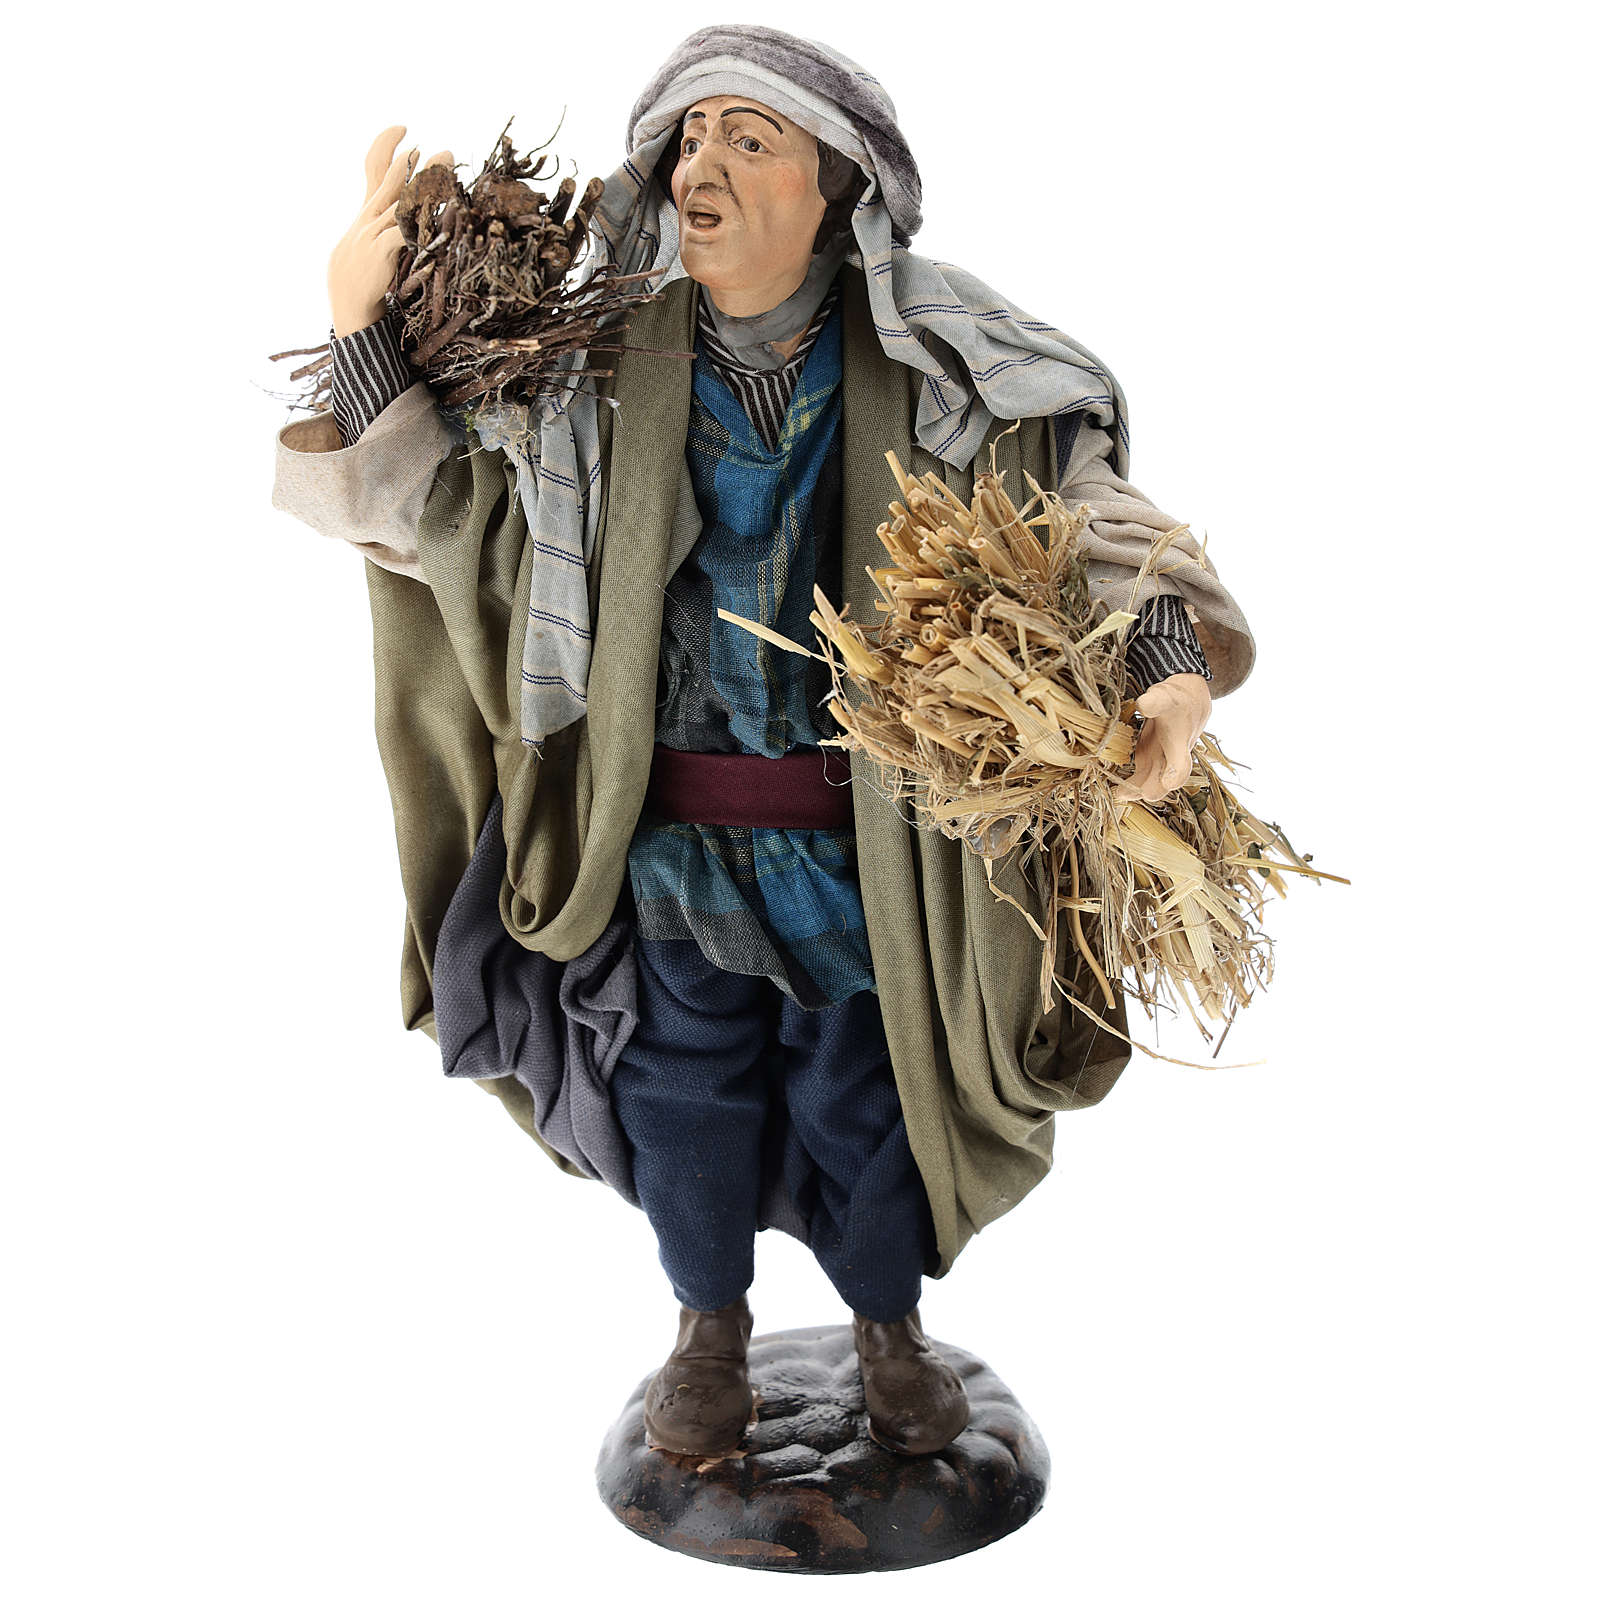 Shepherd with straw for Neapolitan nativity scene 30 cm 4